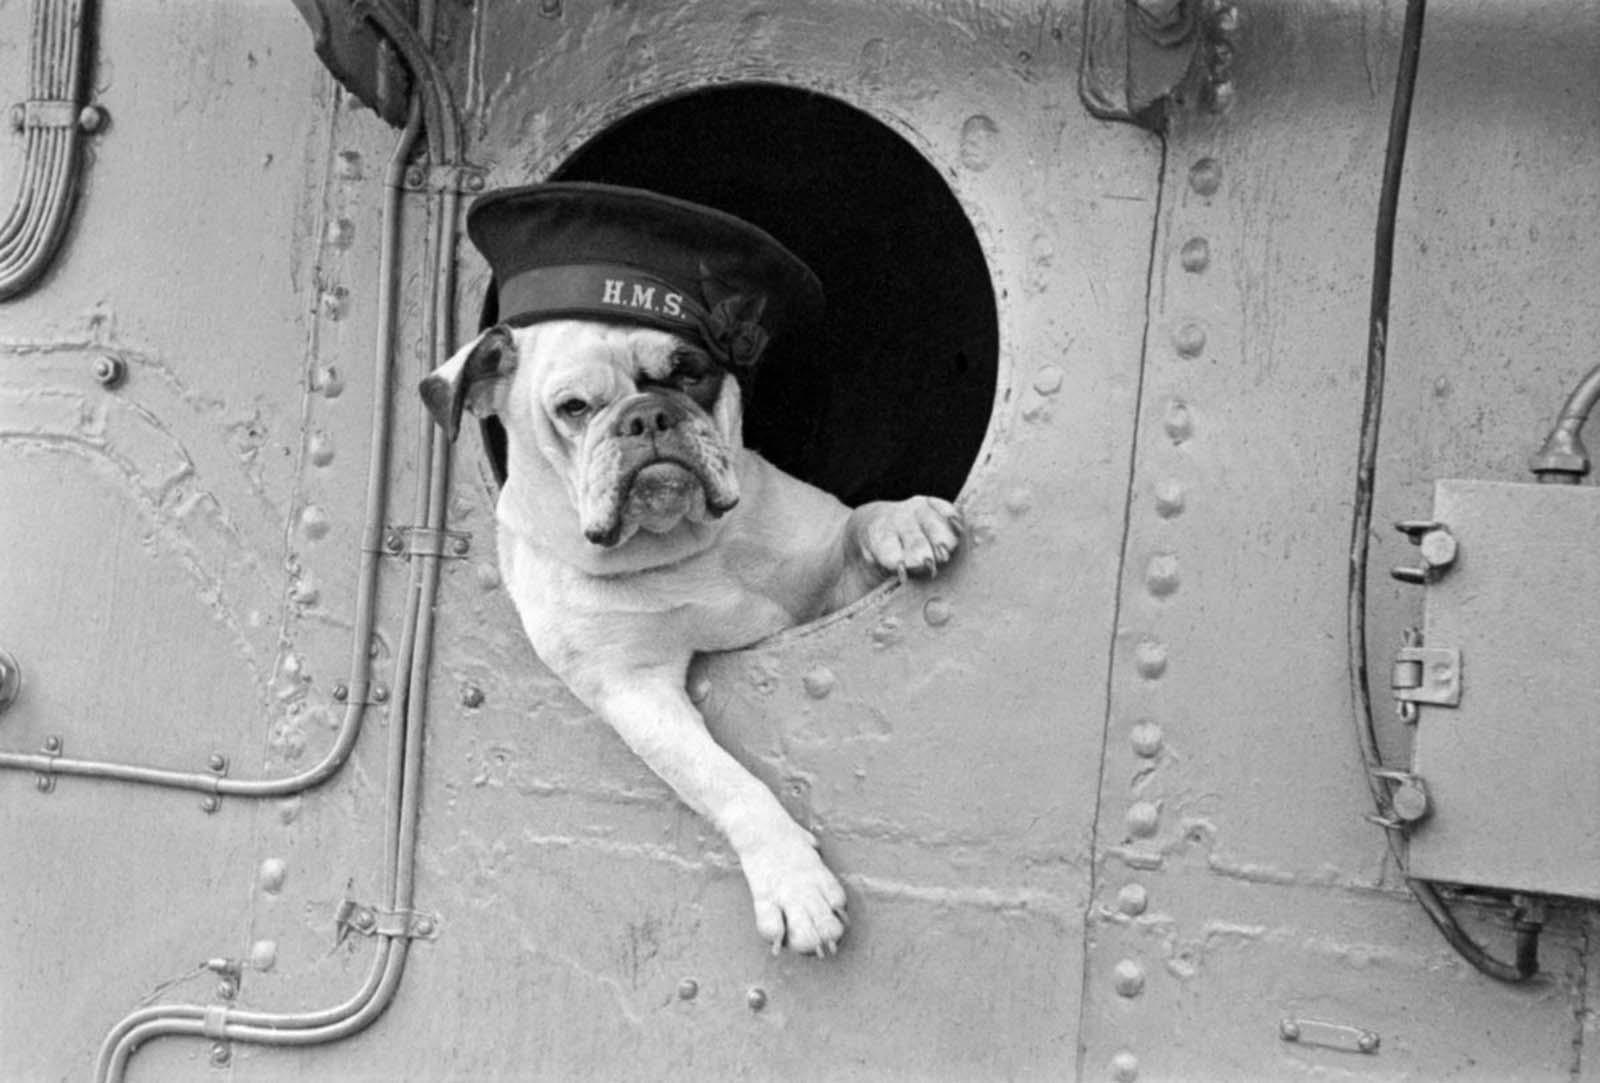 Venus the bulldog, mascot of the destroyer HMS Vansittart.